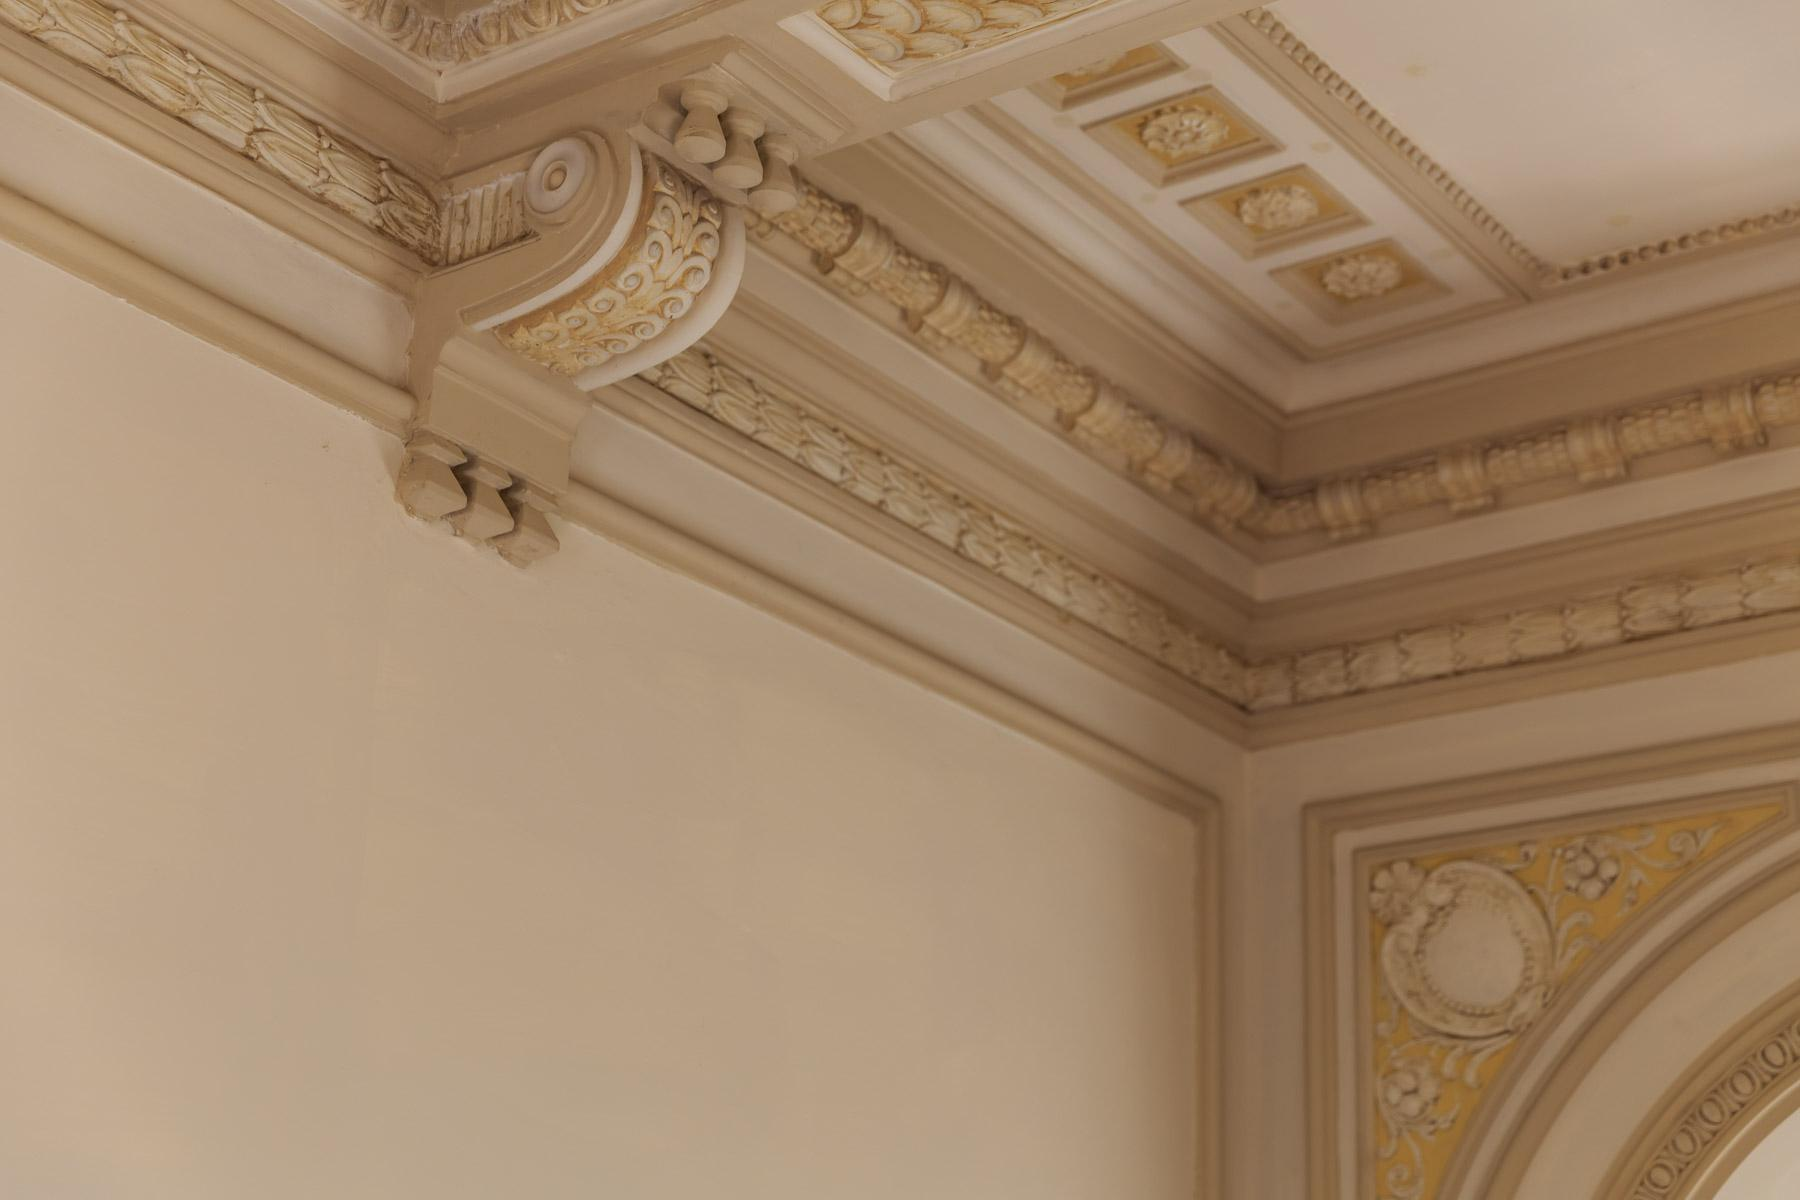 Montecatini Terme小镇优雅的新艺术风格的别墅 - 25